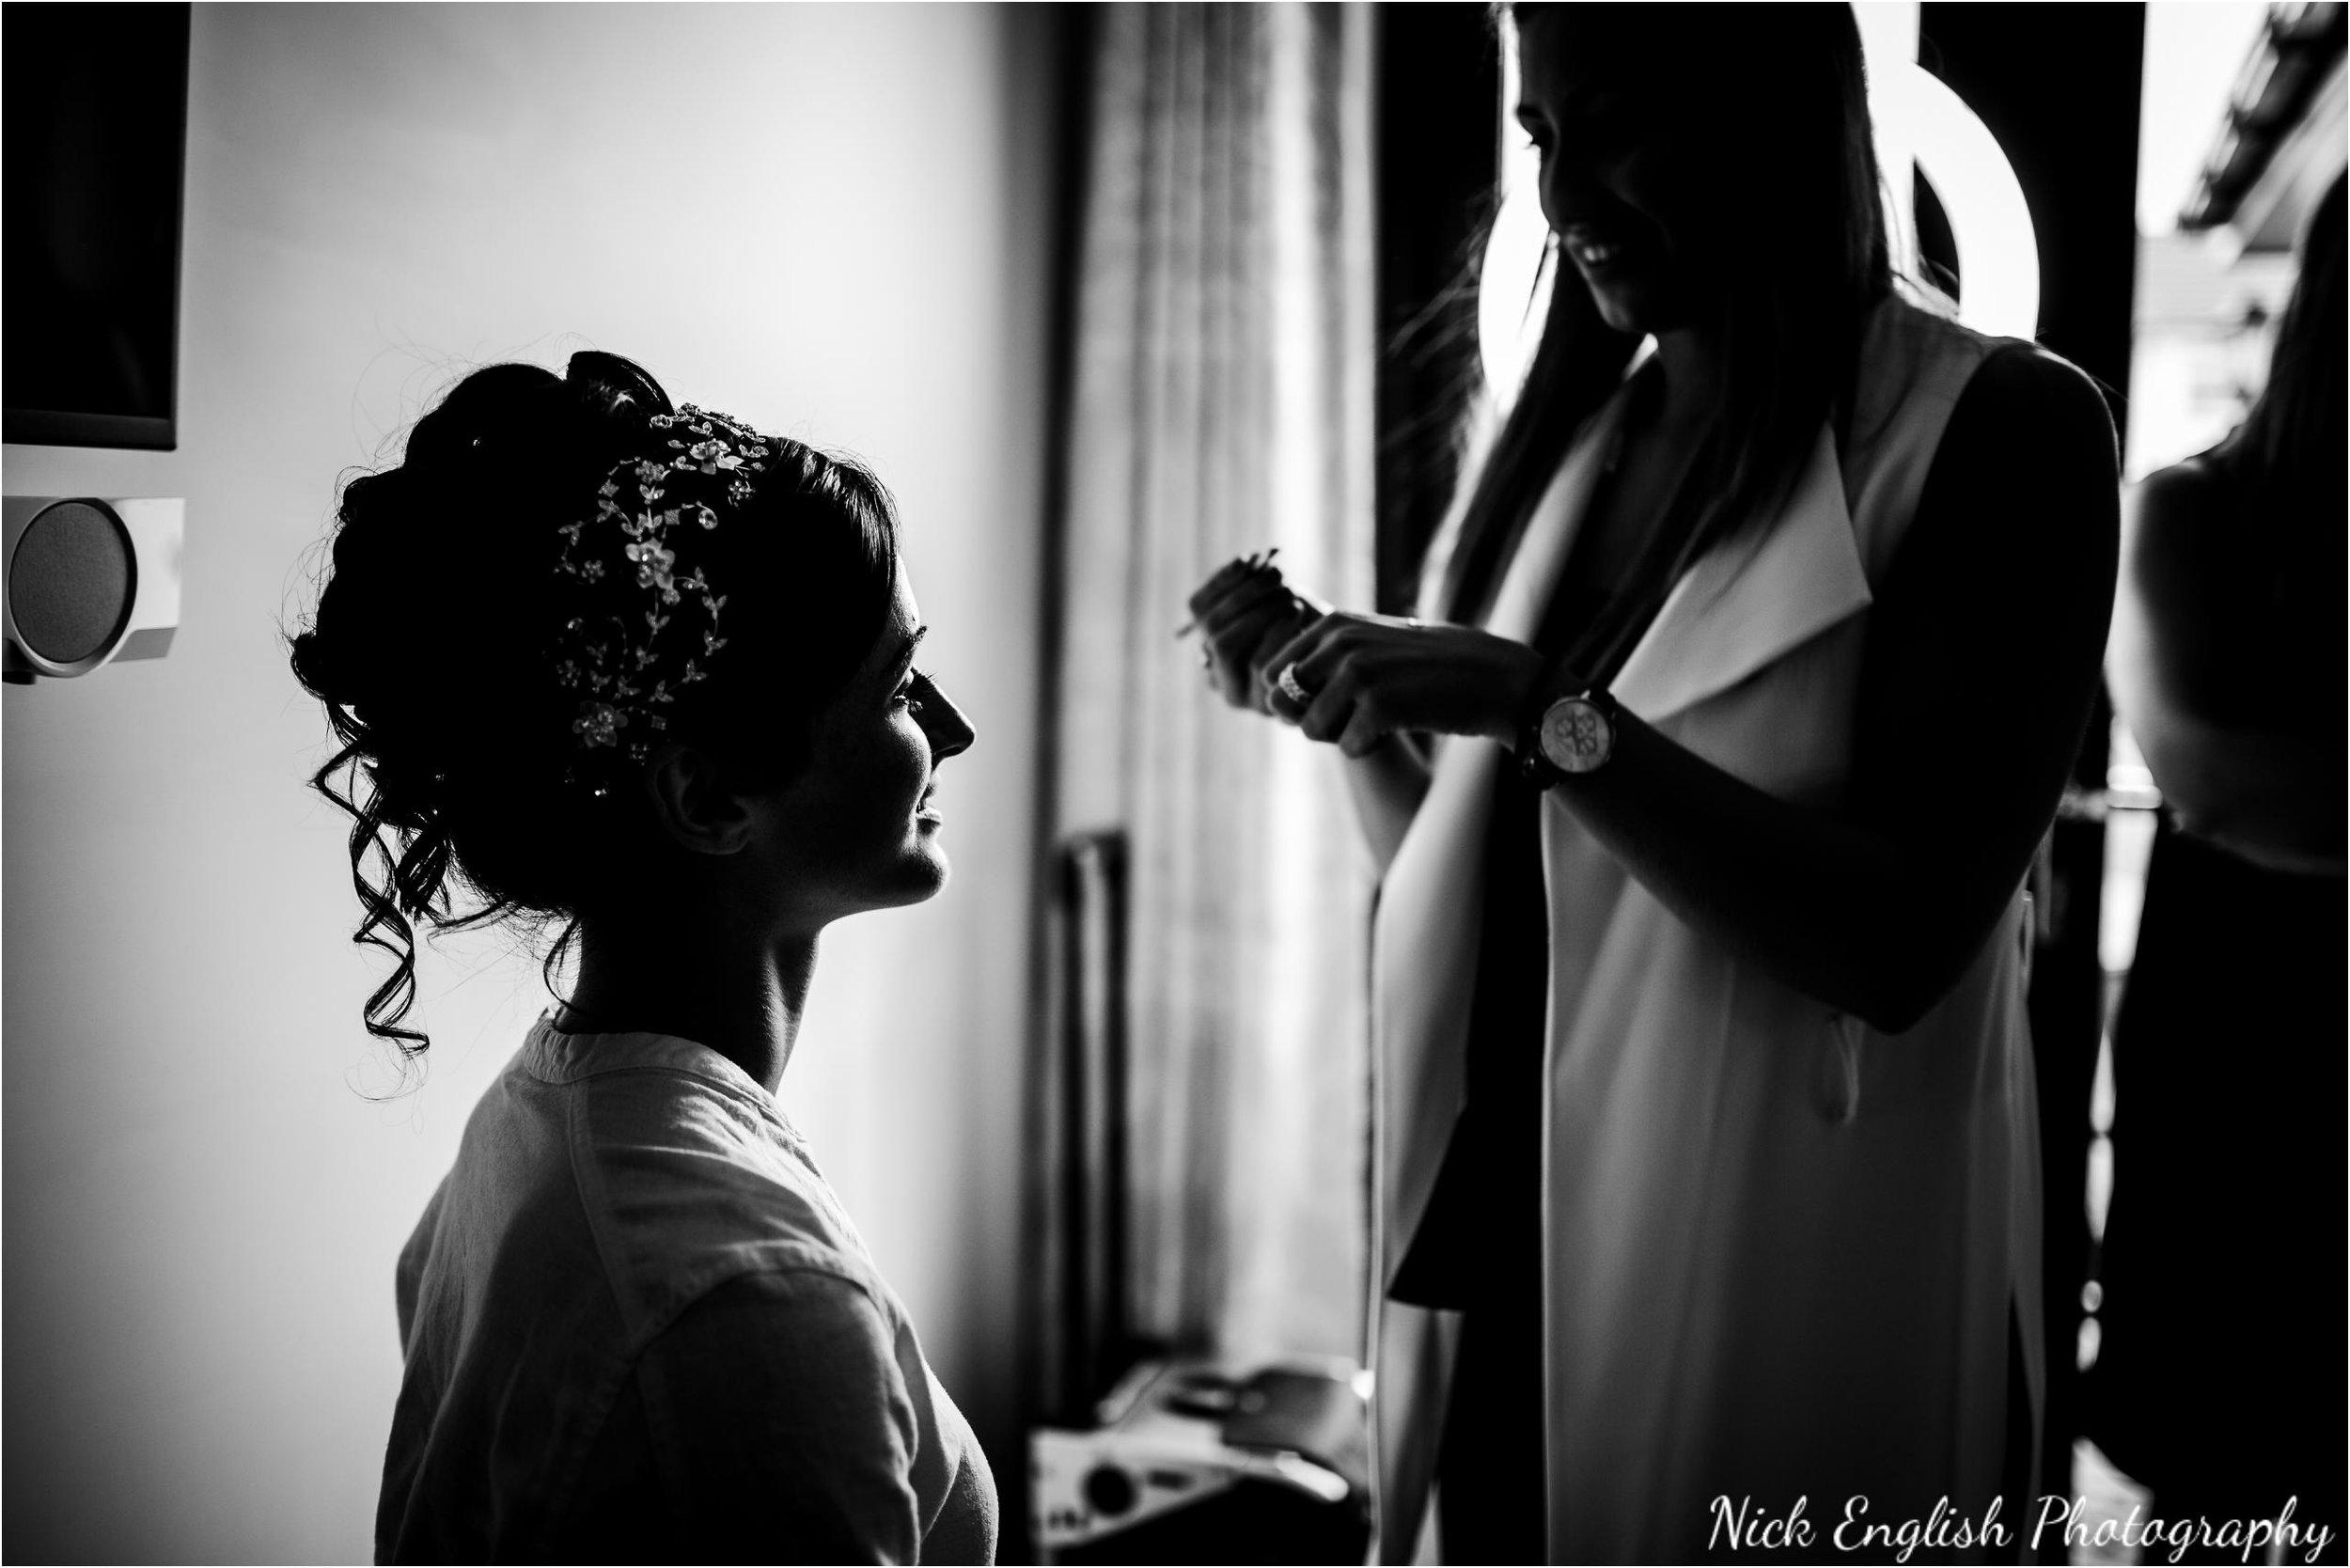 Emily David Wedding Photographs at Barton Grange Preston by Nick English Photography 12jpg.jpeg